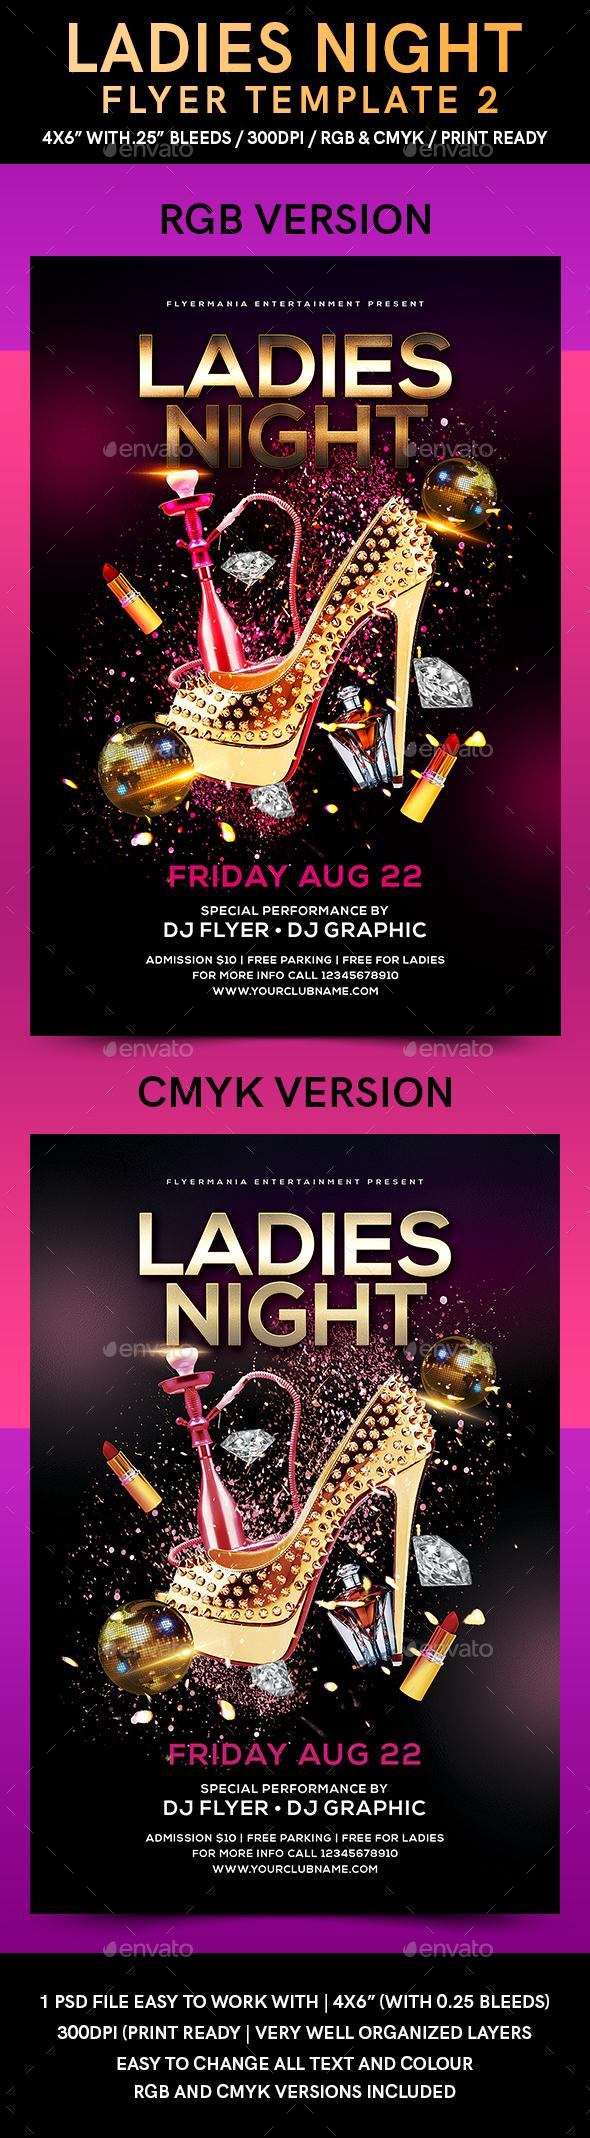 Ladies Night Flyer Template 2 - Flyers Print Templates